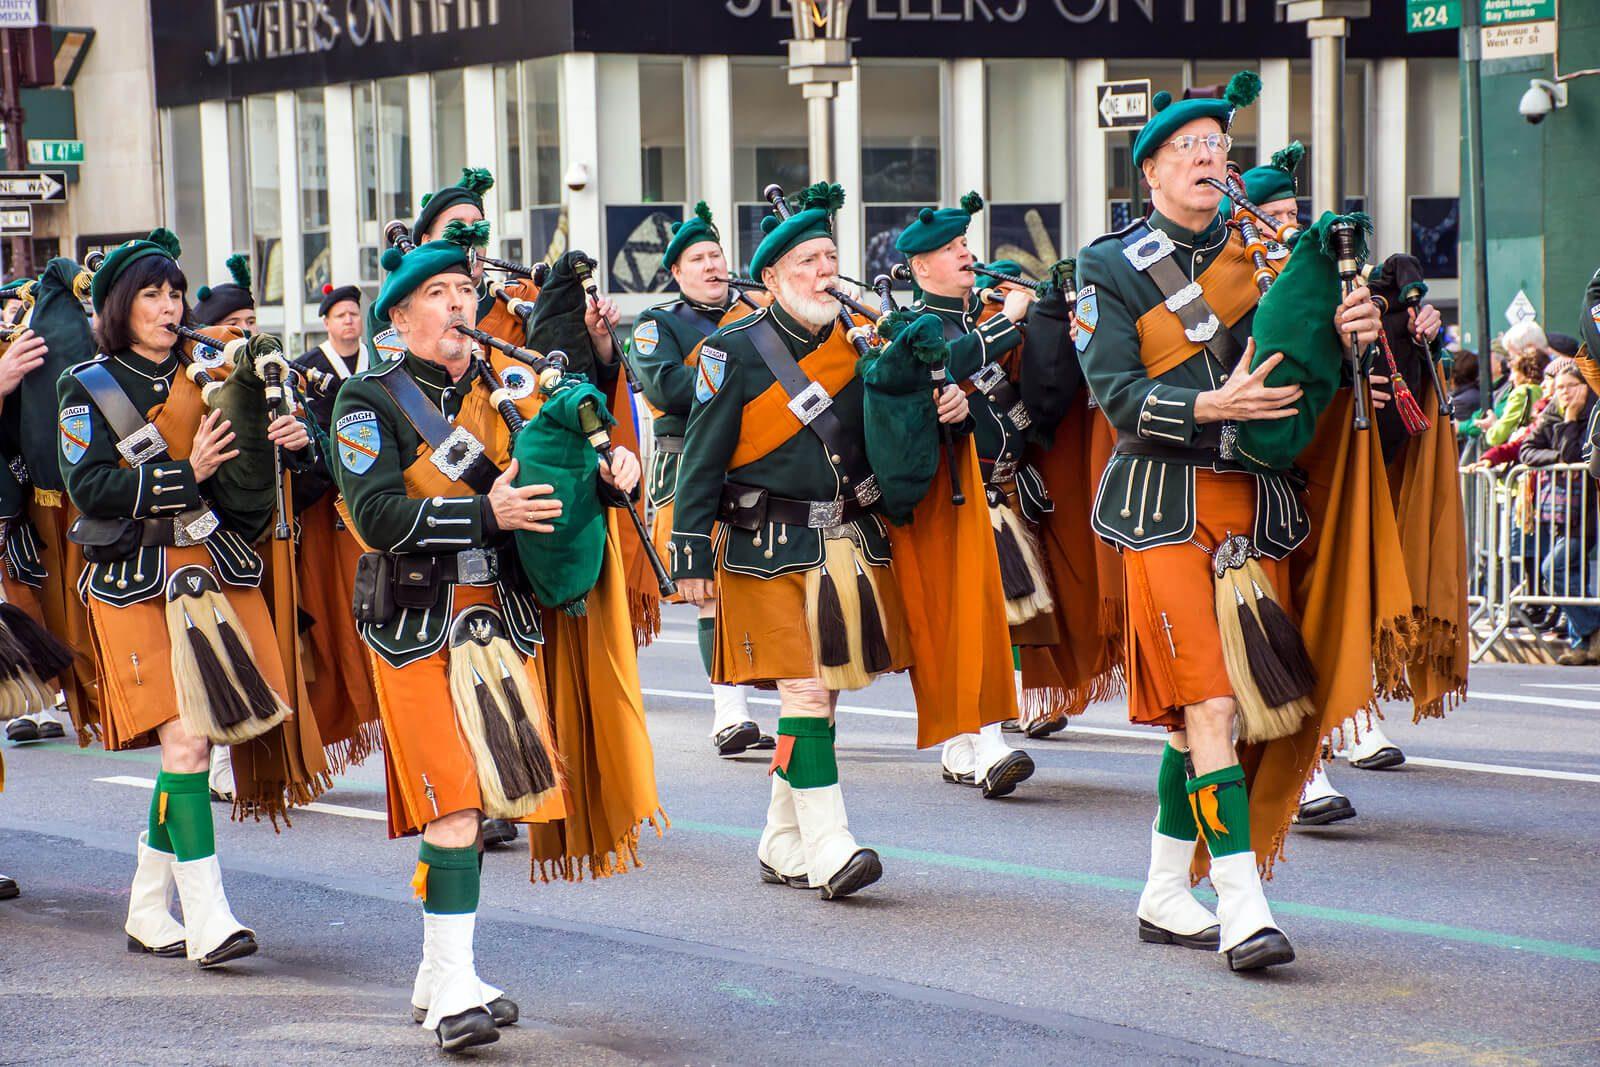 St. Patricks Day Spirits – 3 Great Irish Whiskey Cocktails